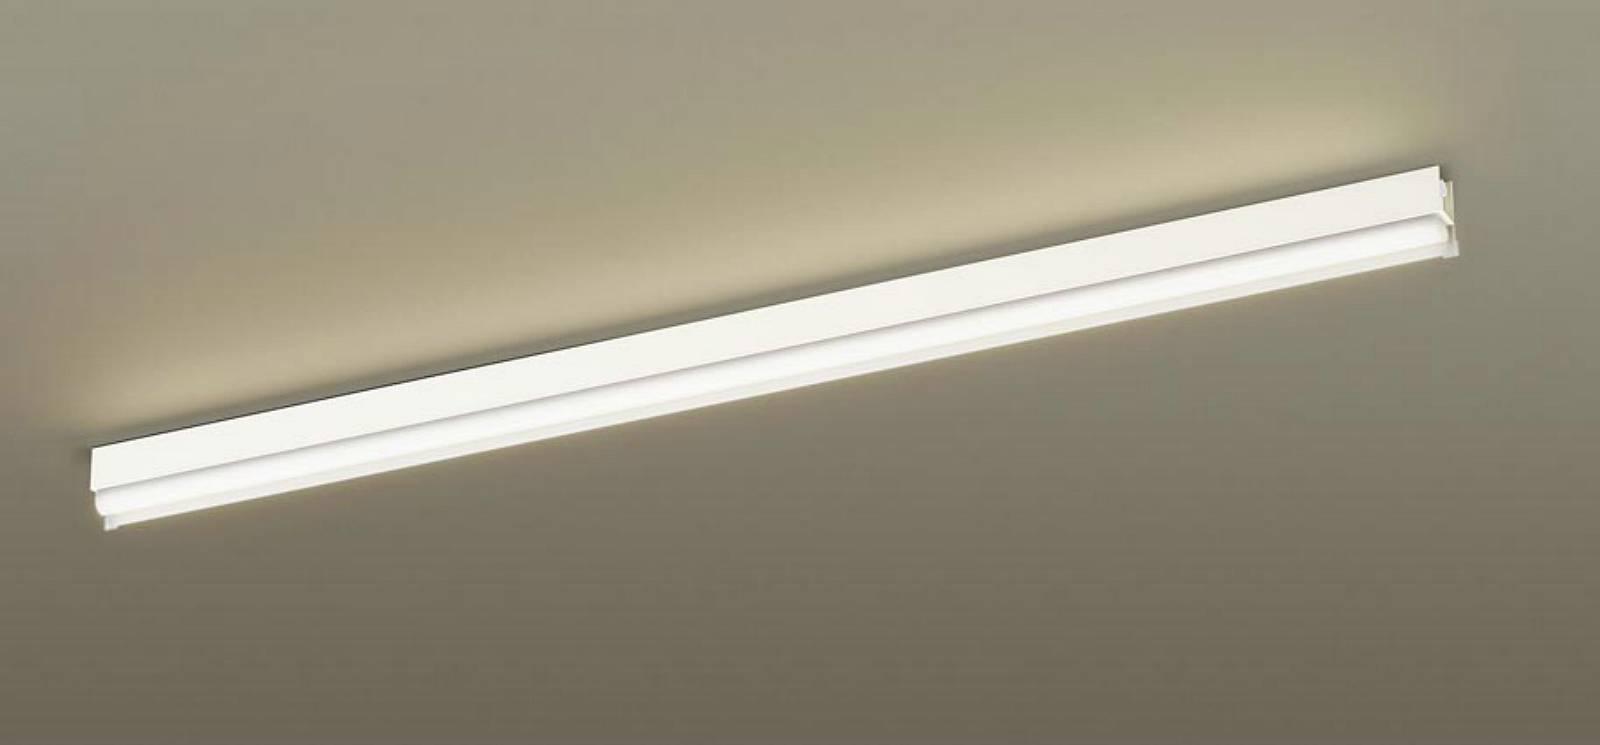 T区分 パナソニック LGB50660LB1 ベースライト 建築化照明器具 畳数設定無し LED【setsuden_led】